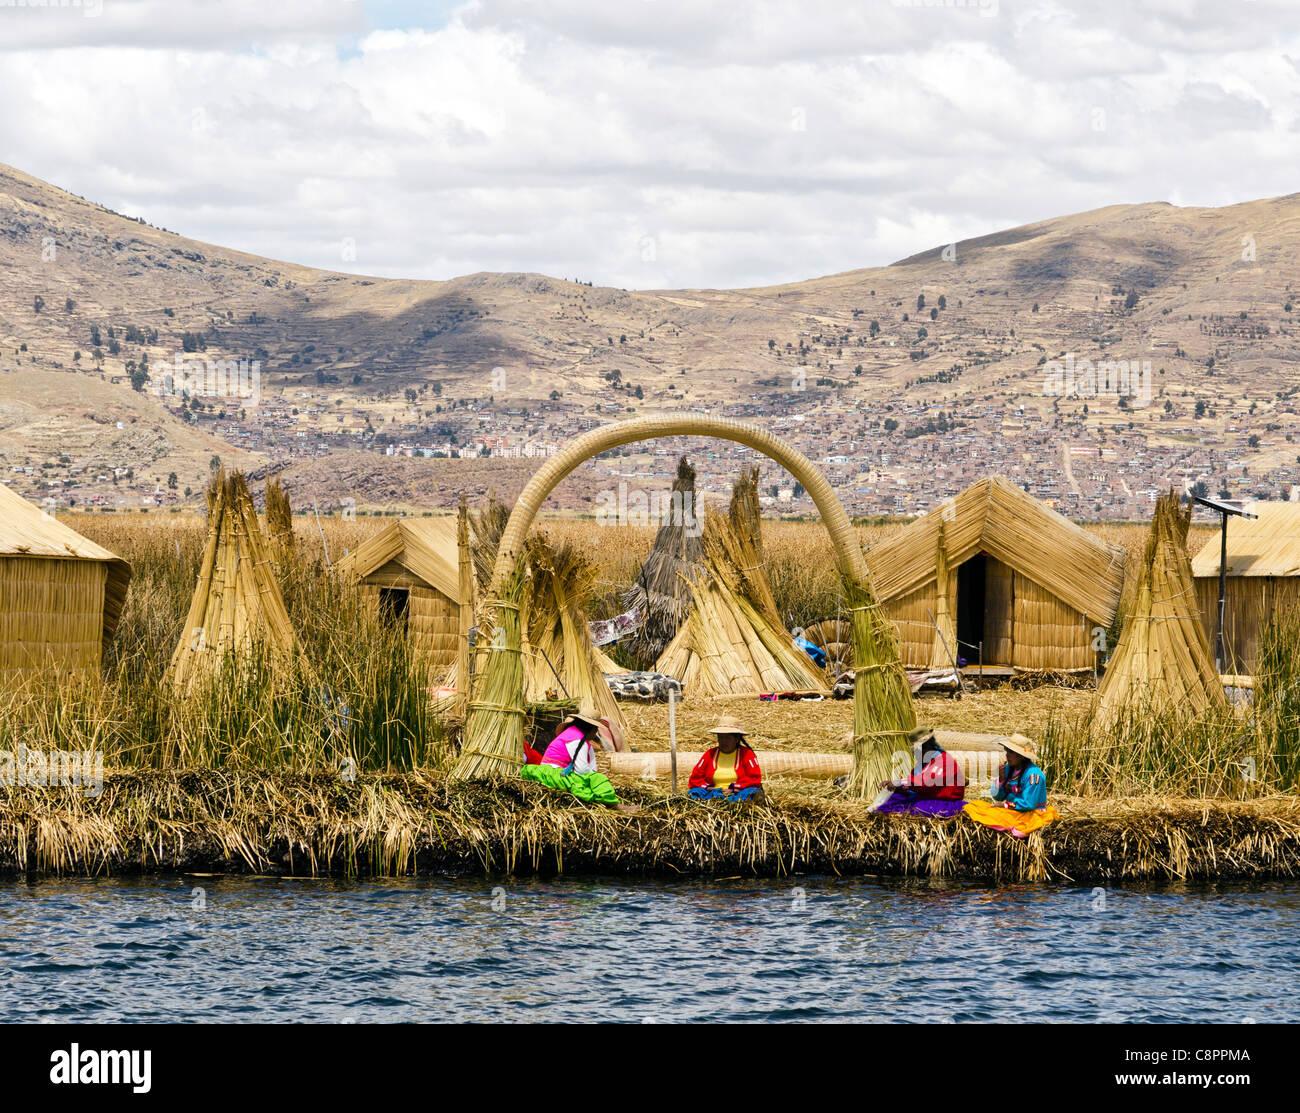 Women wearing traditional peruvian costume Uros island Titicaca lake Puno Peru - Stock Image